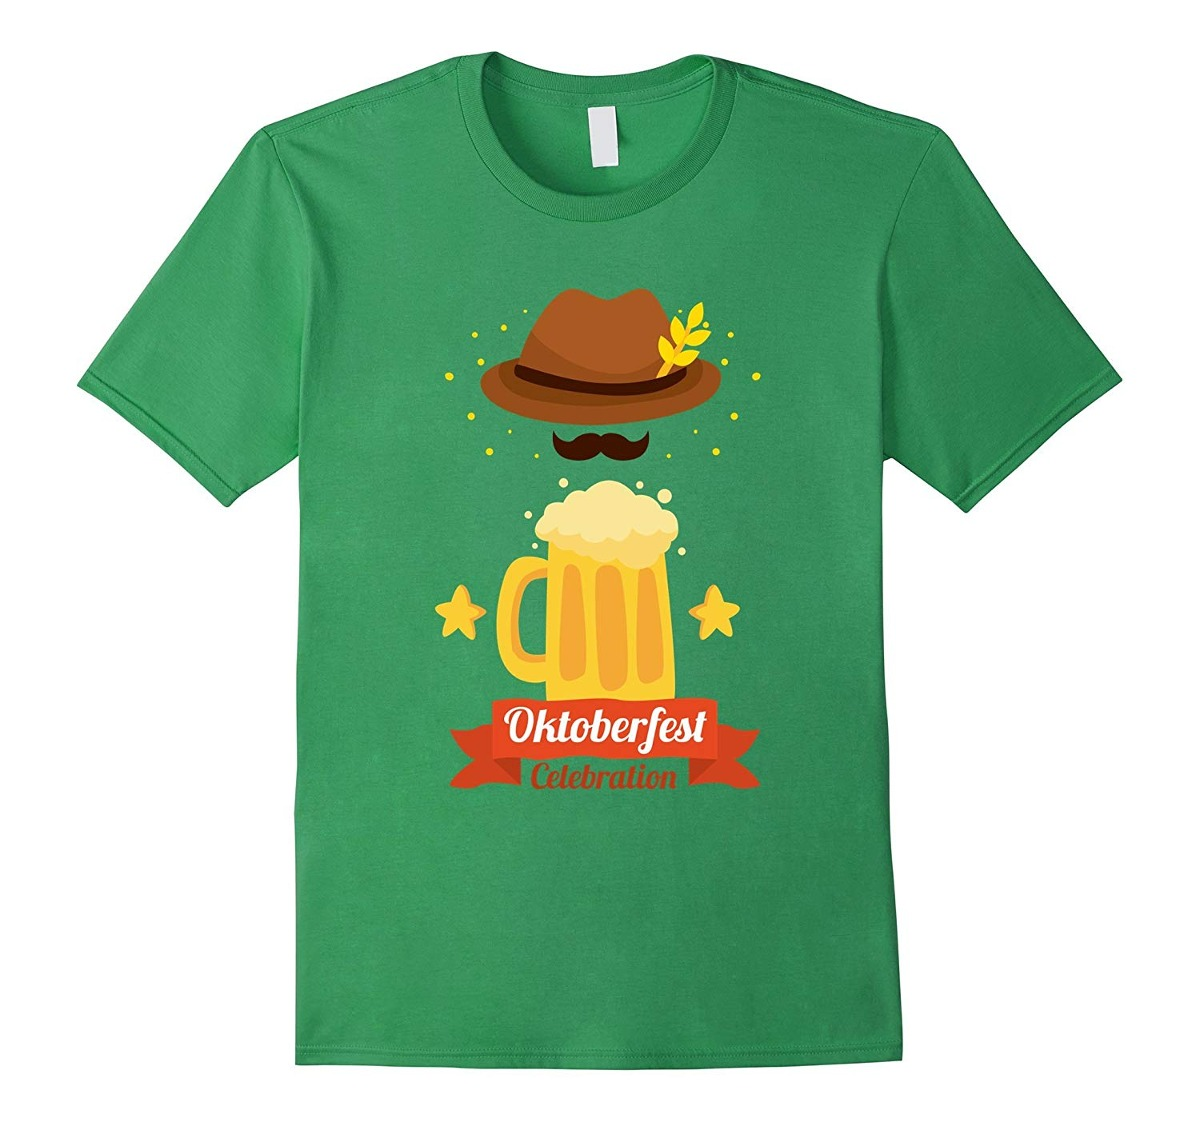 e58ae3a3fa746 Halloween Cerveza Alemana Sombrero Bigote Camiseta De Oktobe ...